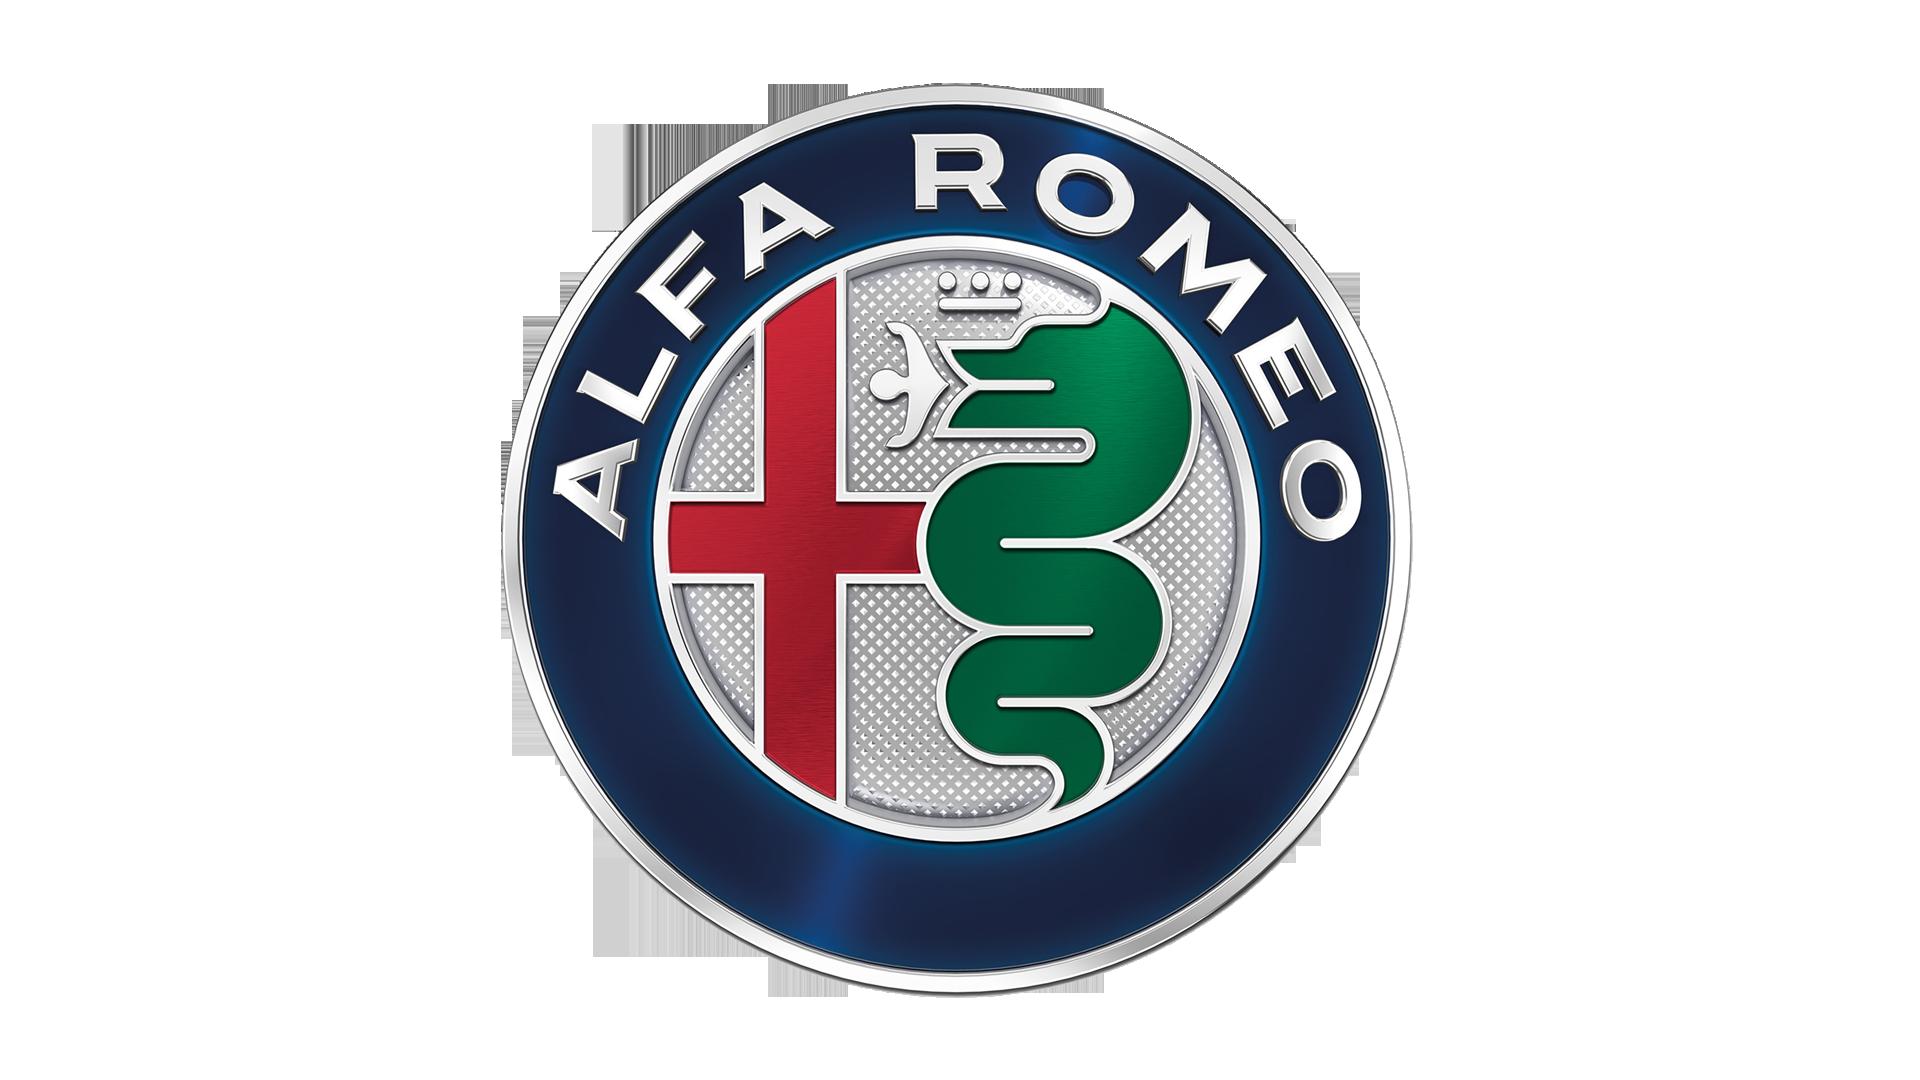 Alfa Romeo Emblem 640x480